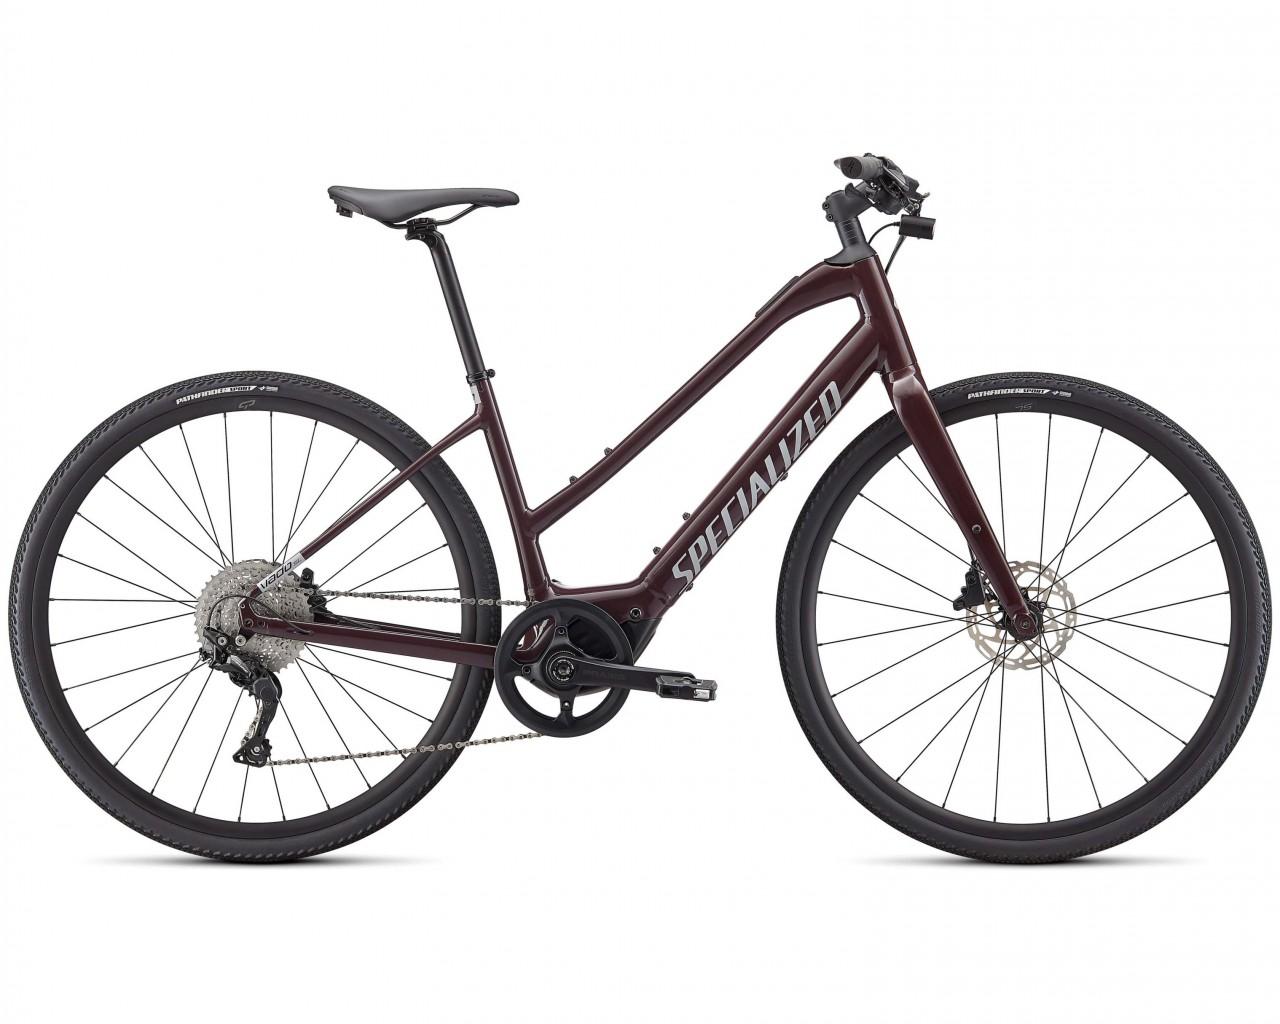 Specialized Vado SL 4.0 Step-Through - Elektro Trapez Trekking Bike 2021 | cast umber-silver reflect